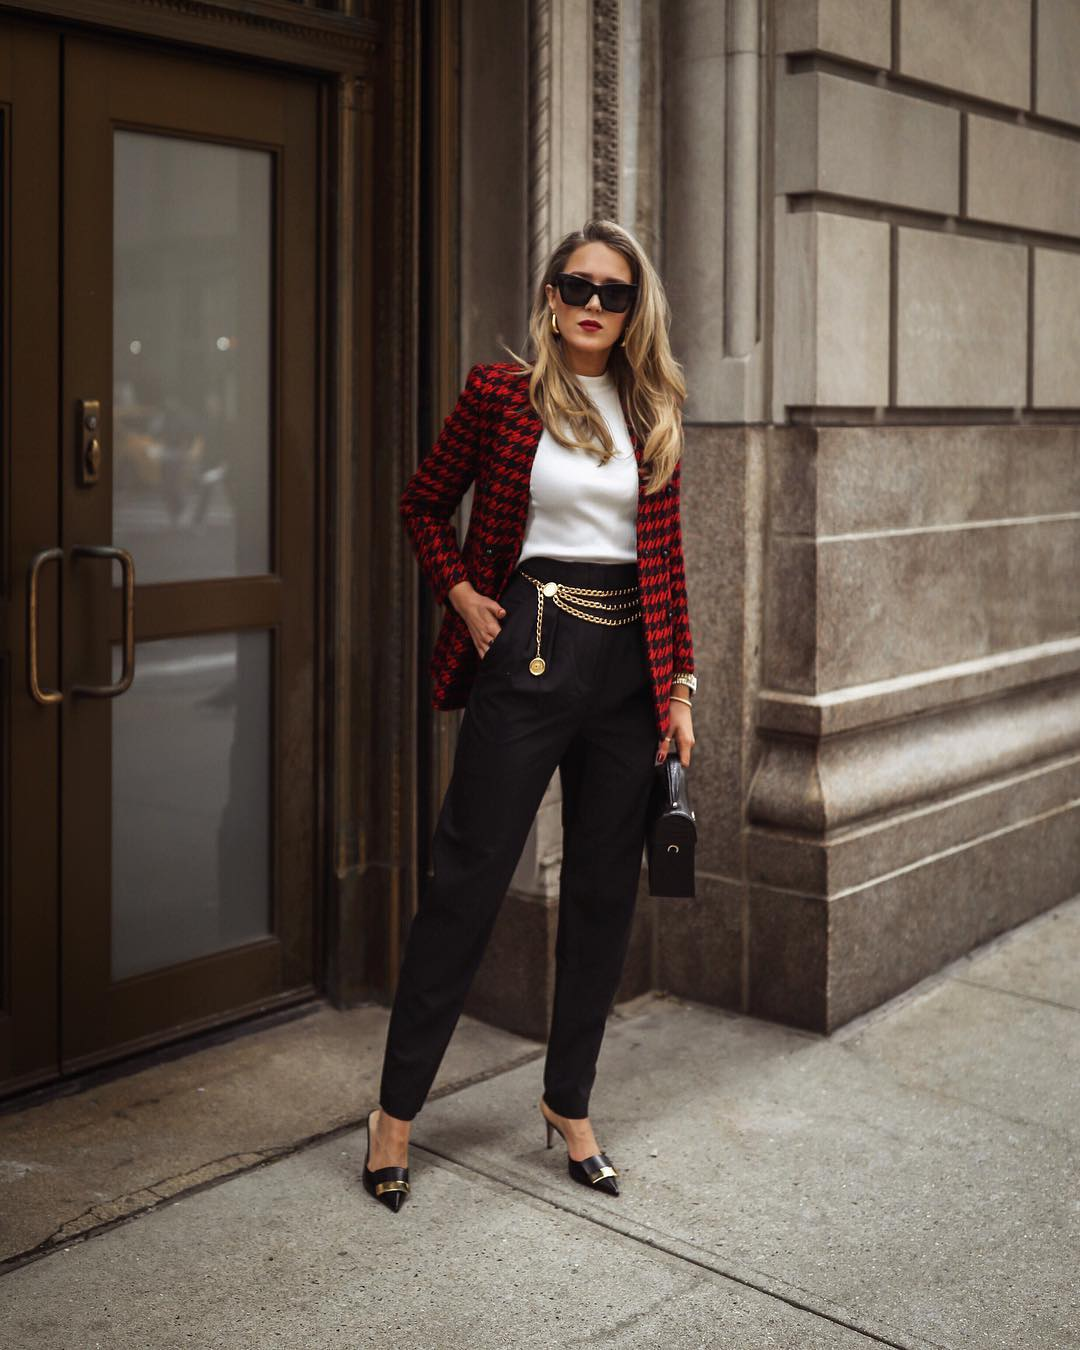 брюки женские 2019 фото 11